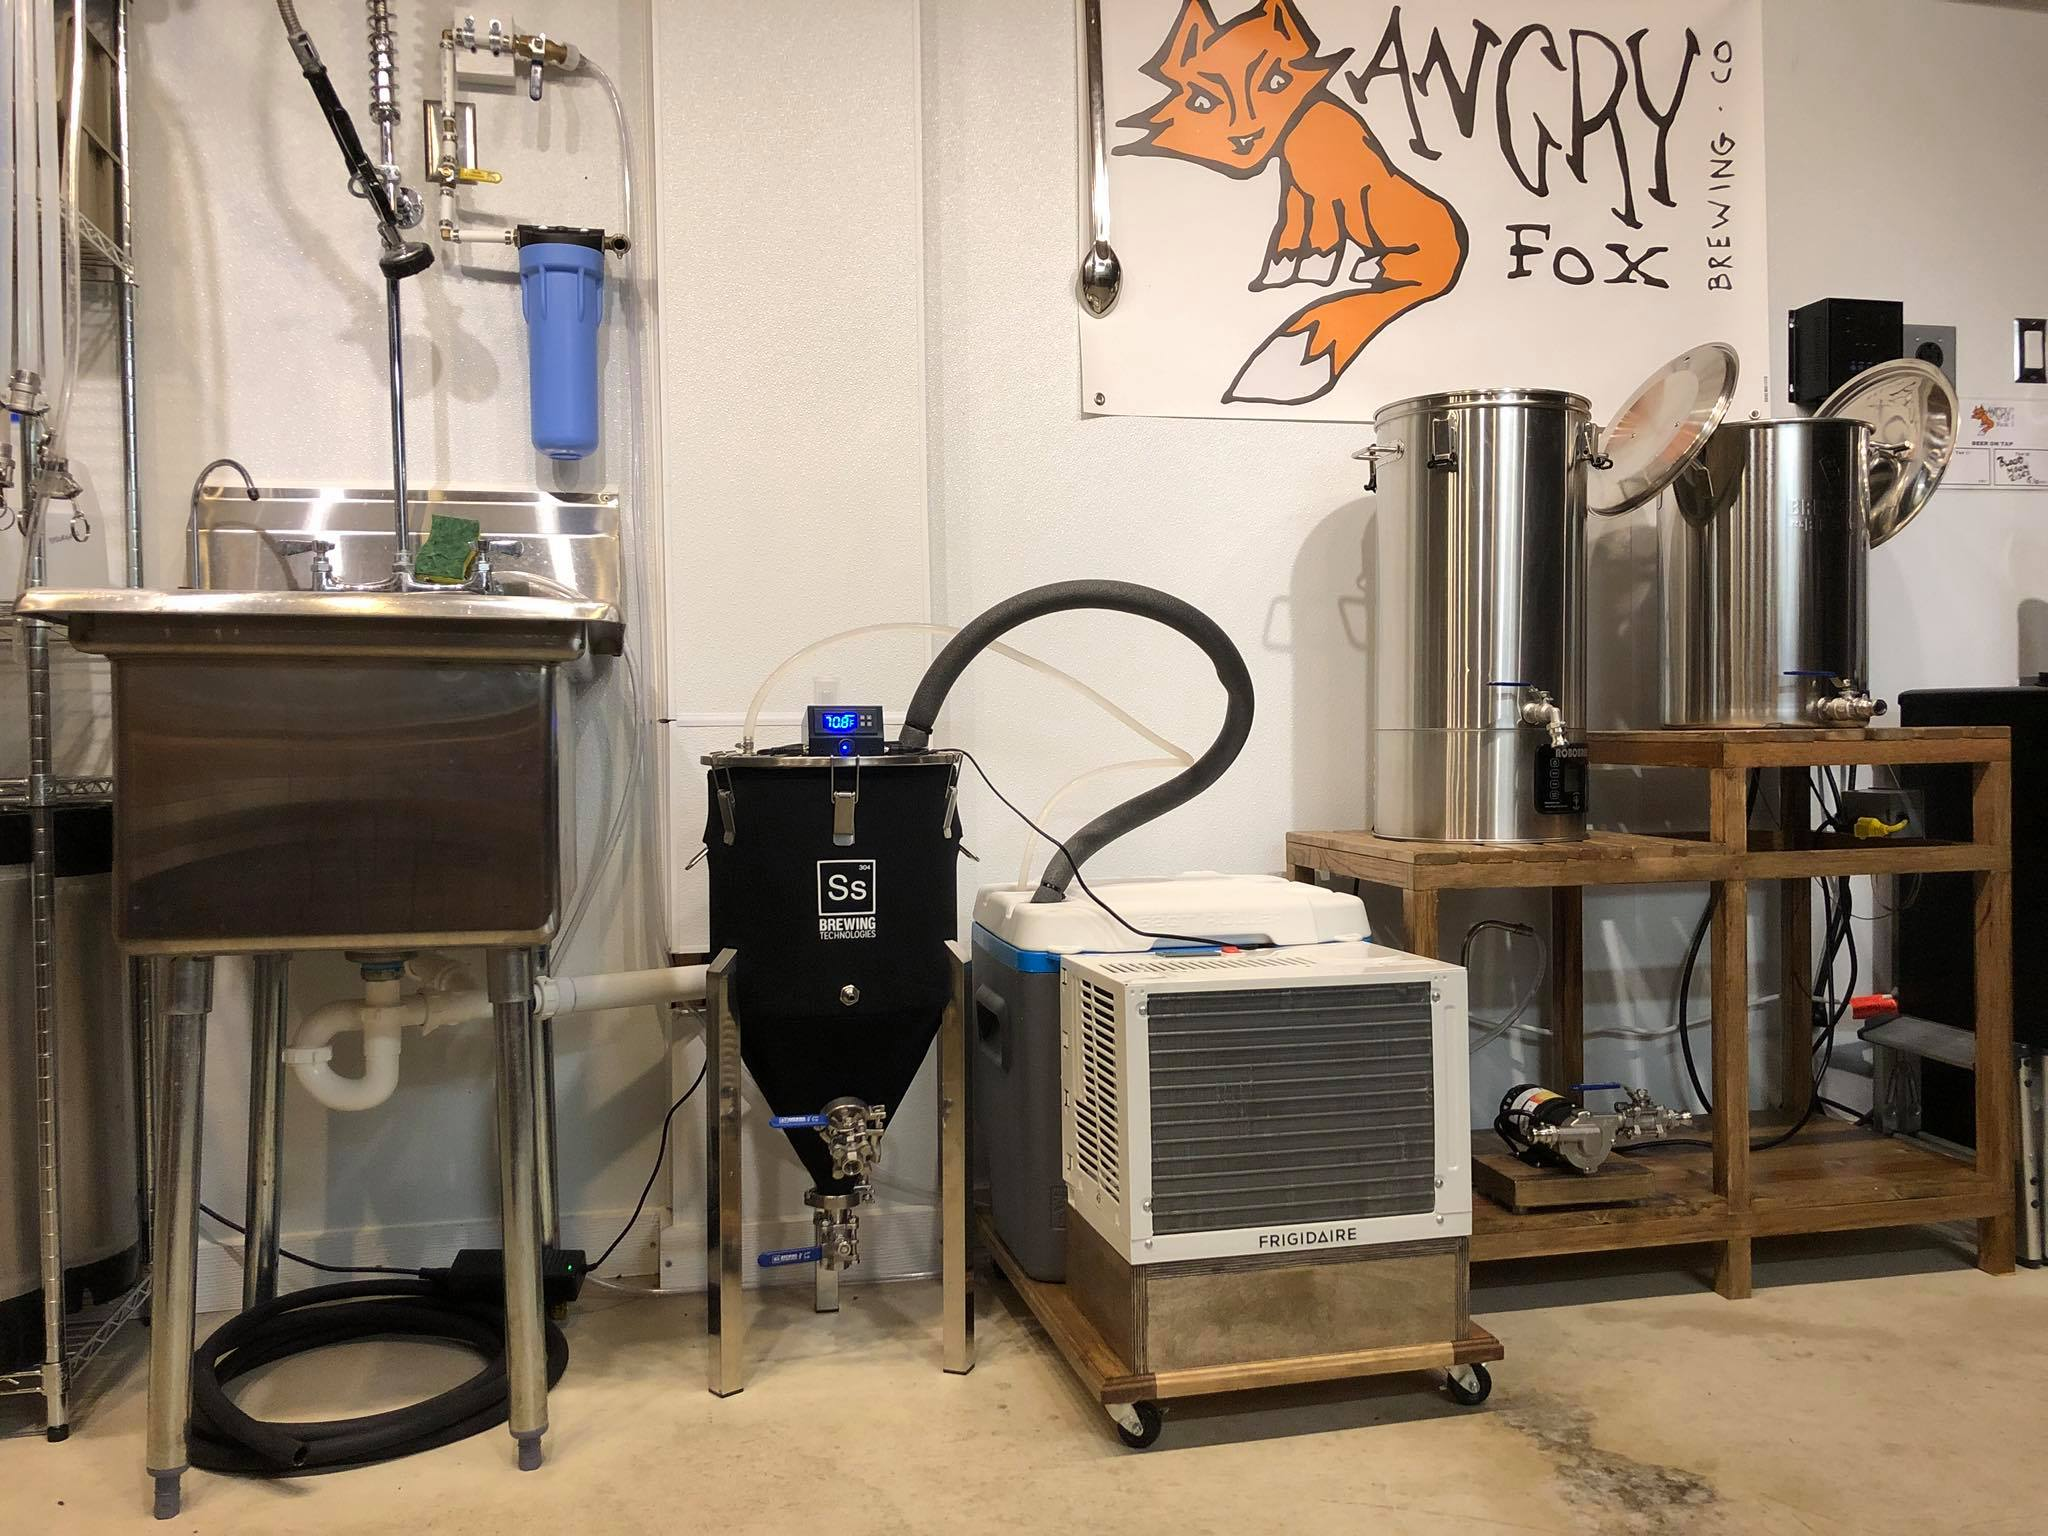 The Ole Window Ac Glycol Chiller Build Beer Kegerator Temperature Controller Using Stc1000 Aquarium 33367613 10106467102641478 4653415680157155328 O